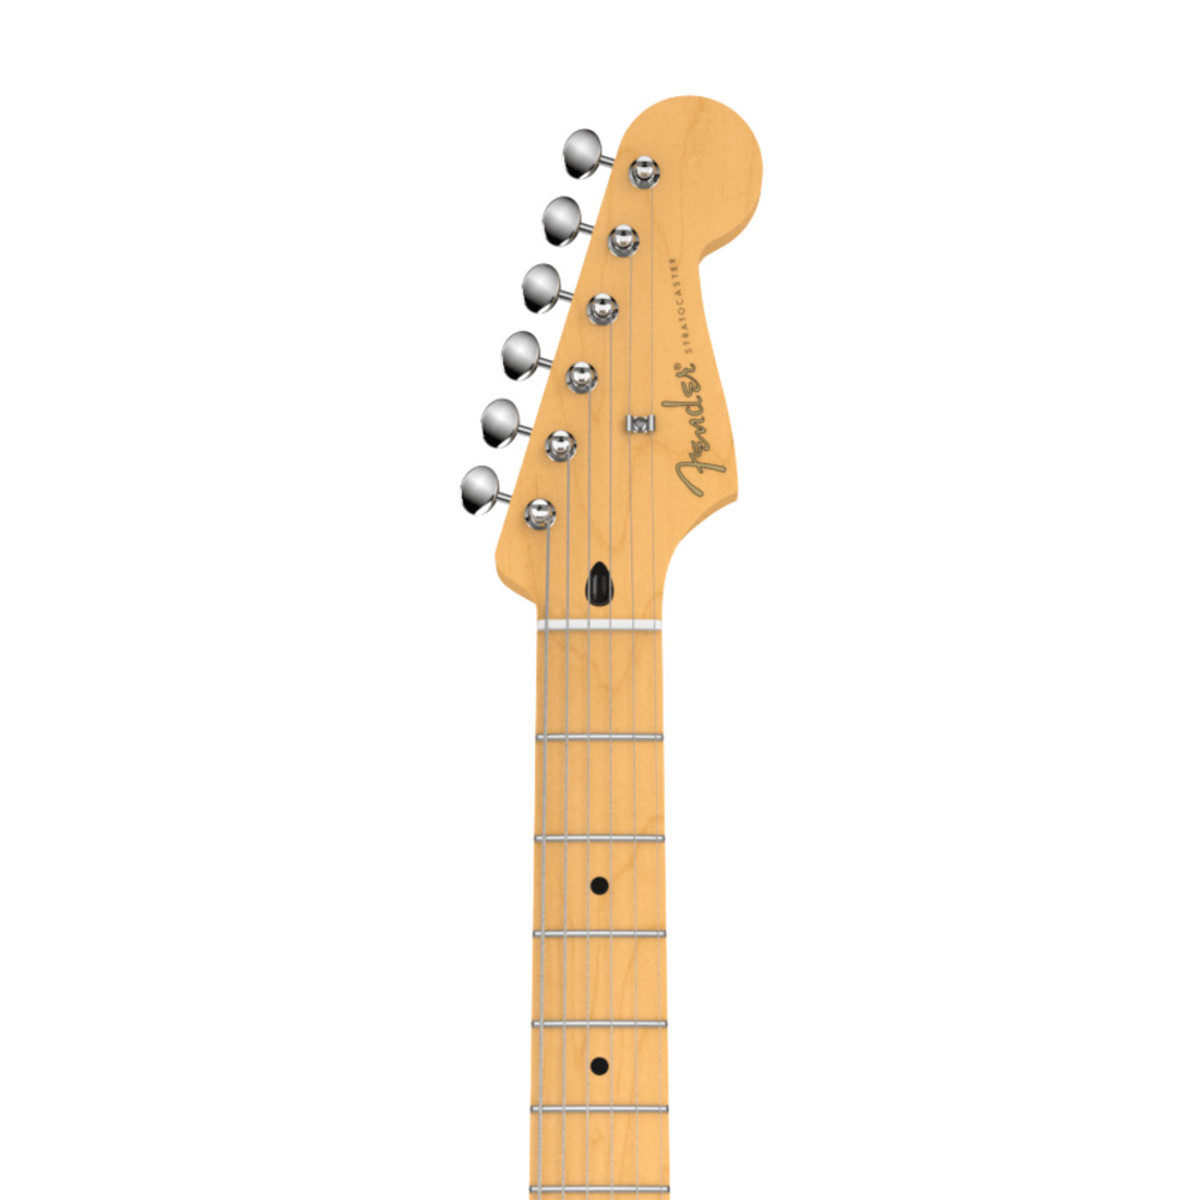 Fender Jimmie Vaughan Tex Mex Stratocaster Guitar 2 Colour Sunburst Wiring